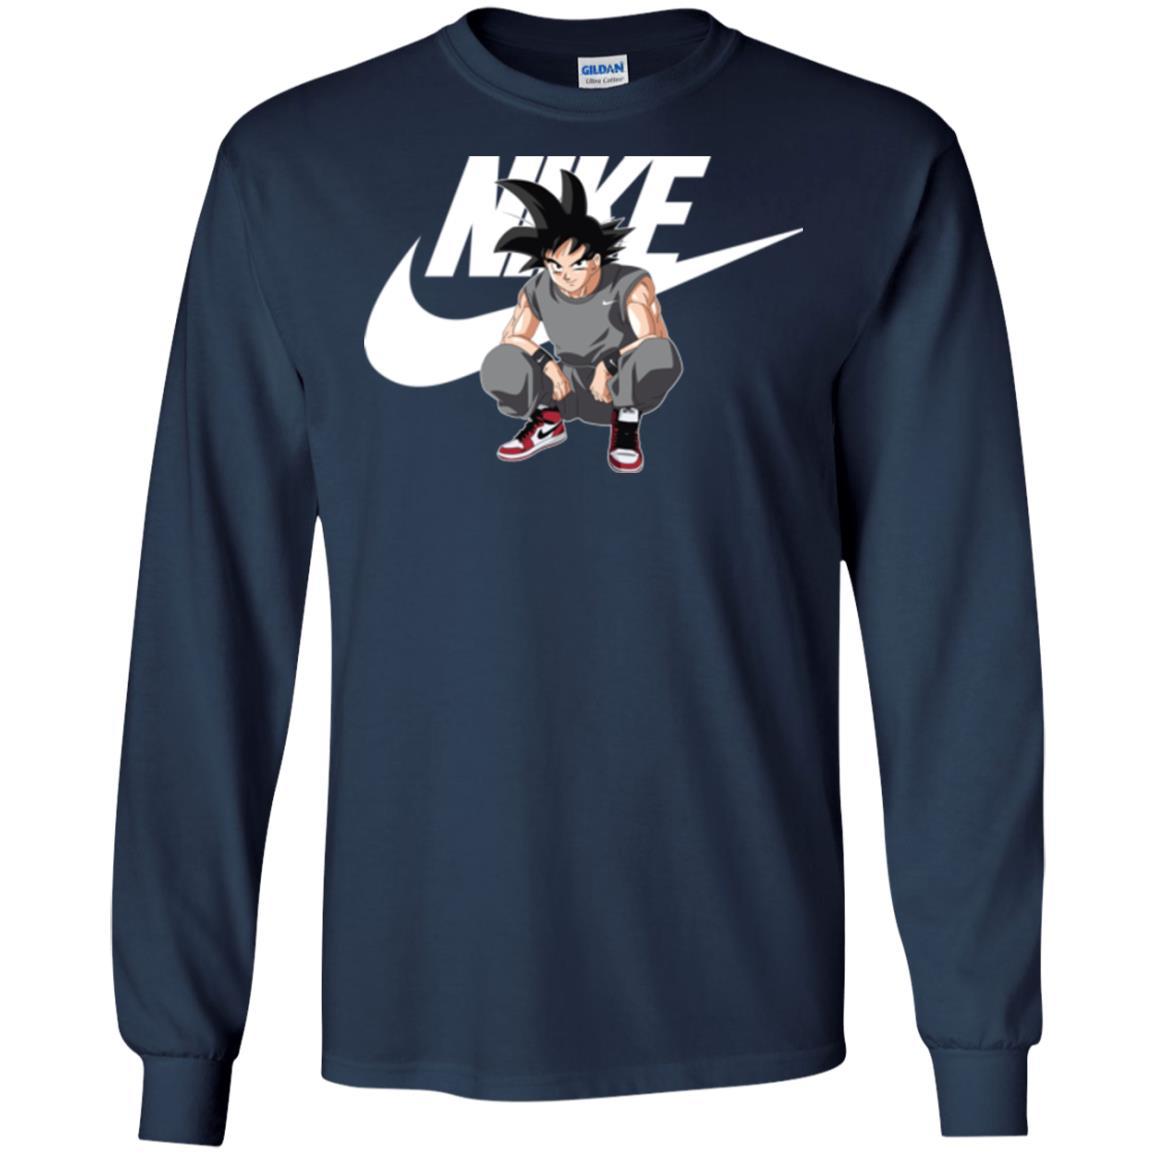 image 253px Songoku Nike Mashup T Shirt, Hoodies, Tank Top